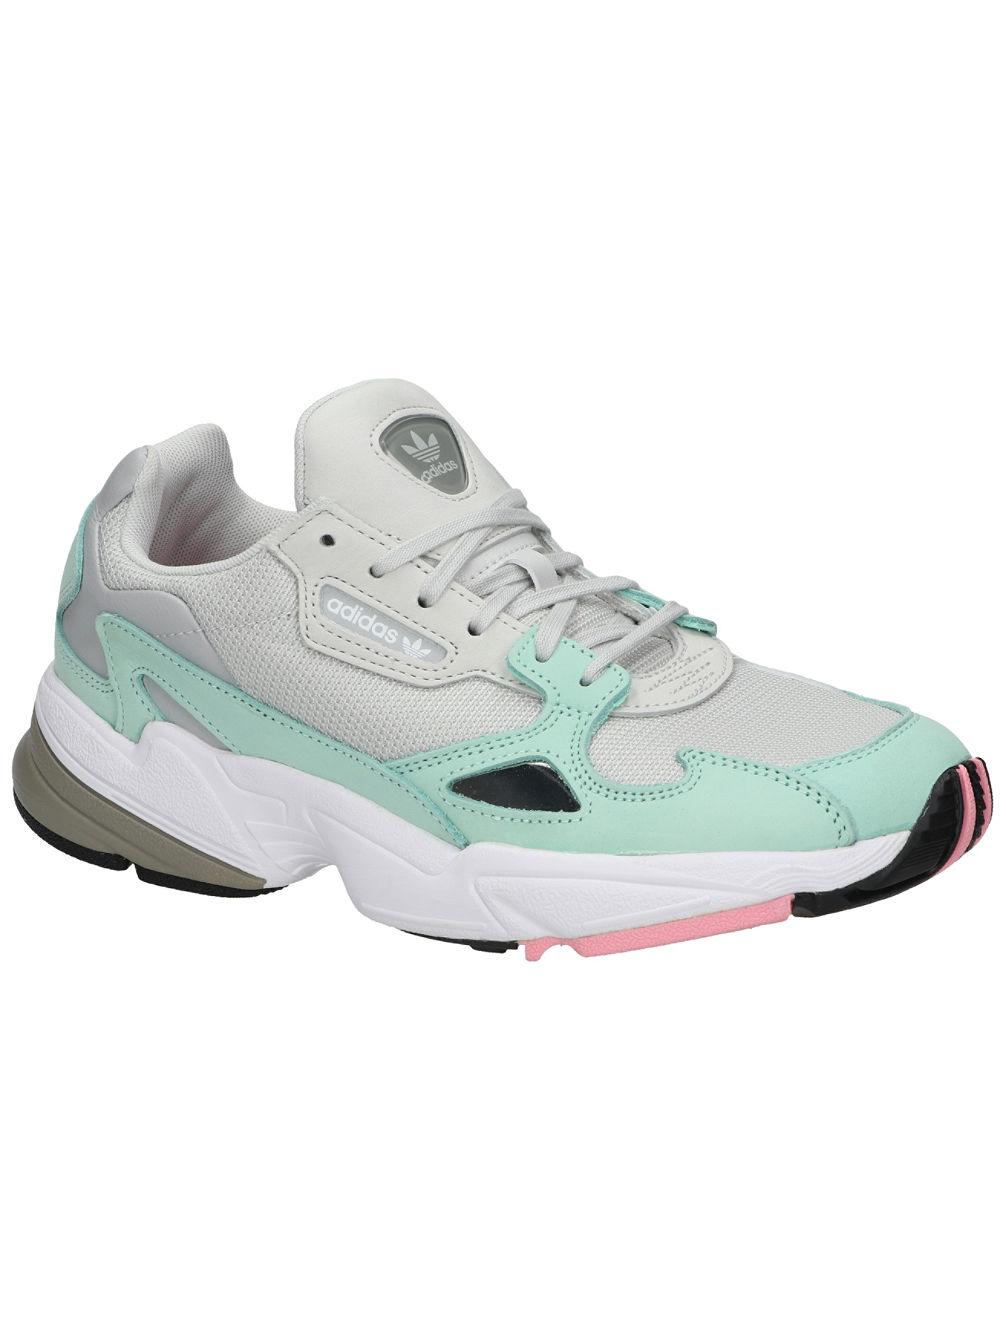 new product 2823c b6b09 Falcon Sneakers Women. adidas Originals